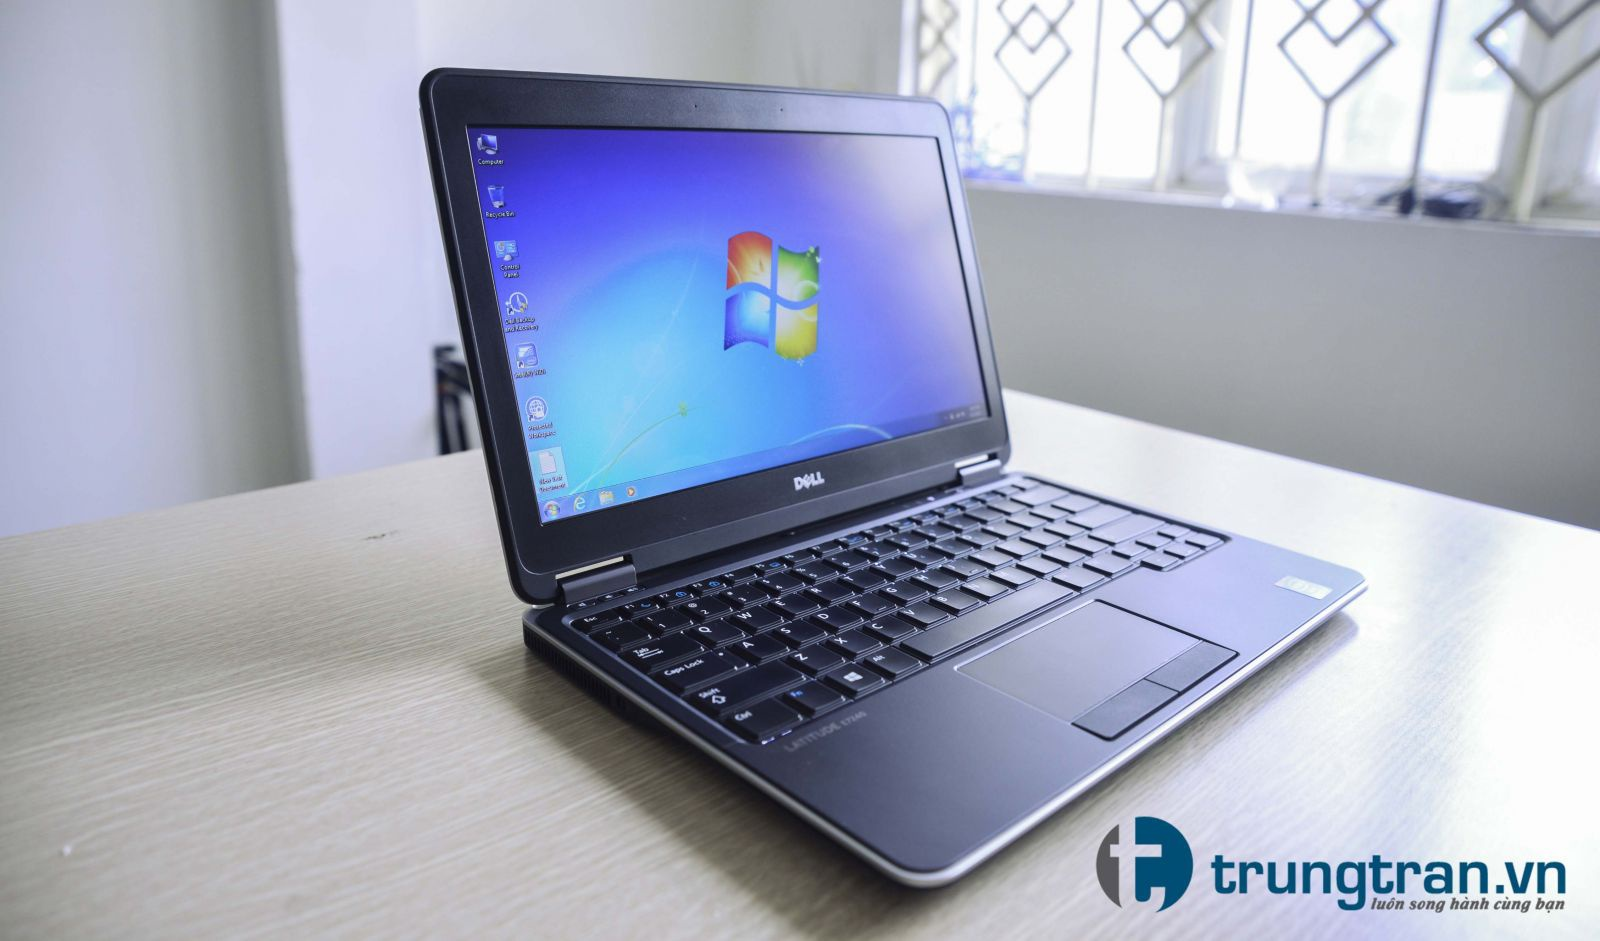 Laptop Dell Latitude E7240 i5 4300 4G SSD128G 12.5in MỎNG Nhẹ 2